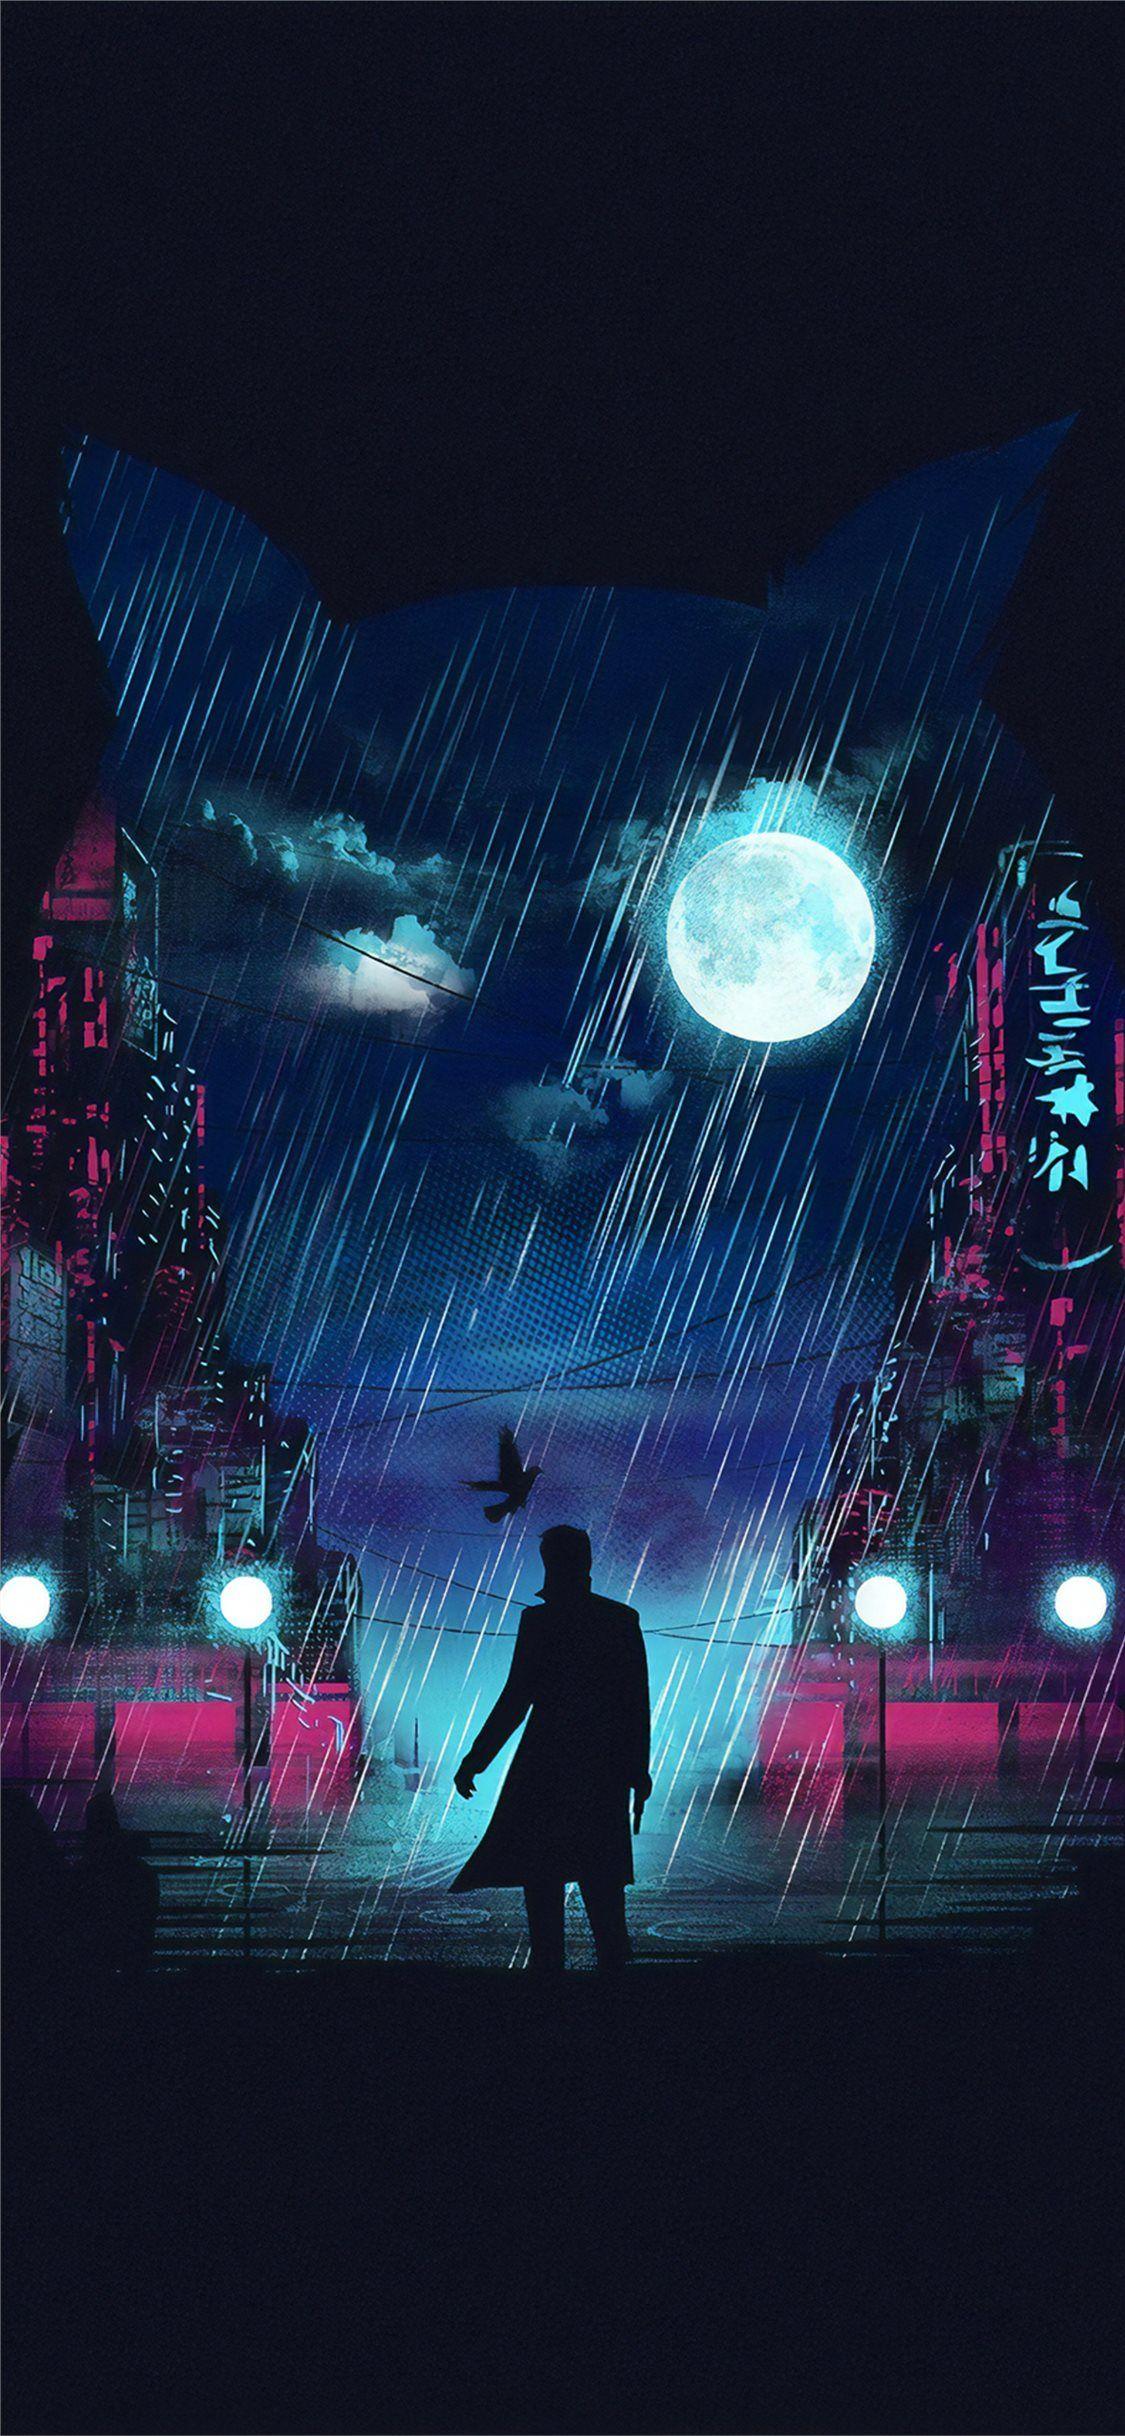 Free Download The Blade Runner Digital Art 4k Wallpaper Beaty Your Iphone Blade Runner 2049 Digital Ar In 2020 Iphone Background Art Blade Runner Iphone Wallpaper